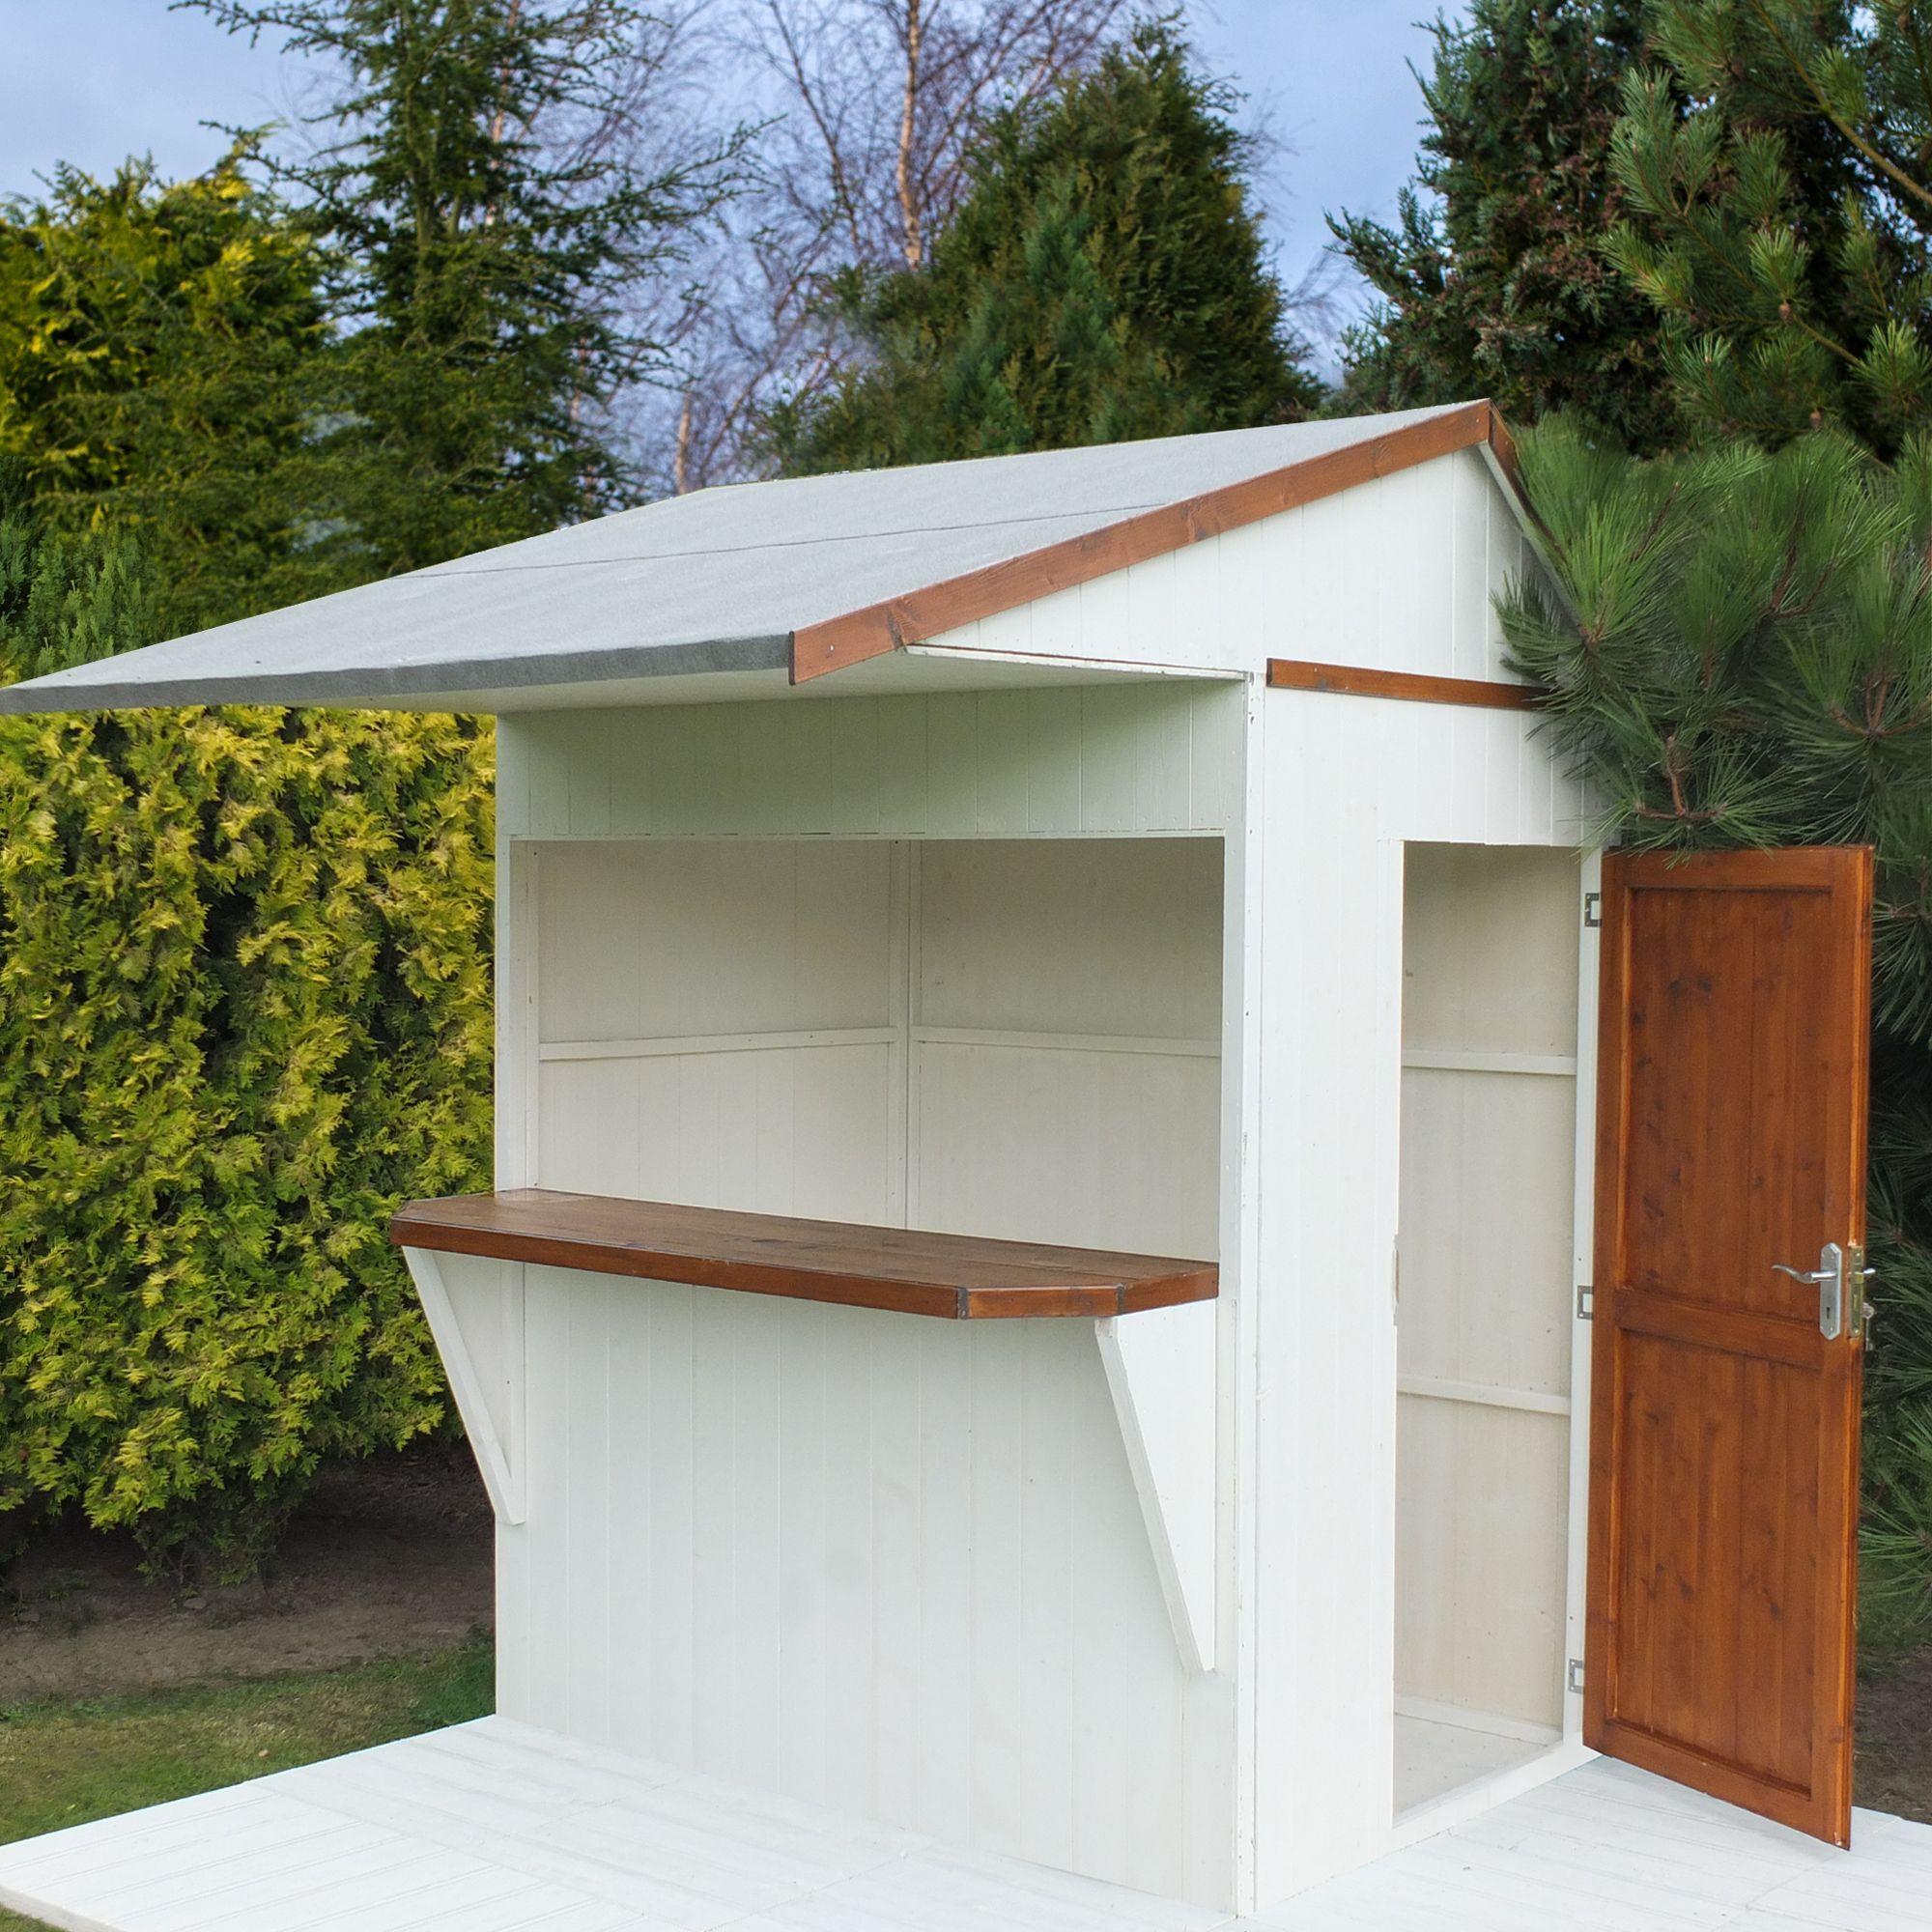 6x4 timber bar shiplap timber bar garden store with assembly service - Garden Sheds B Q